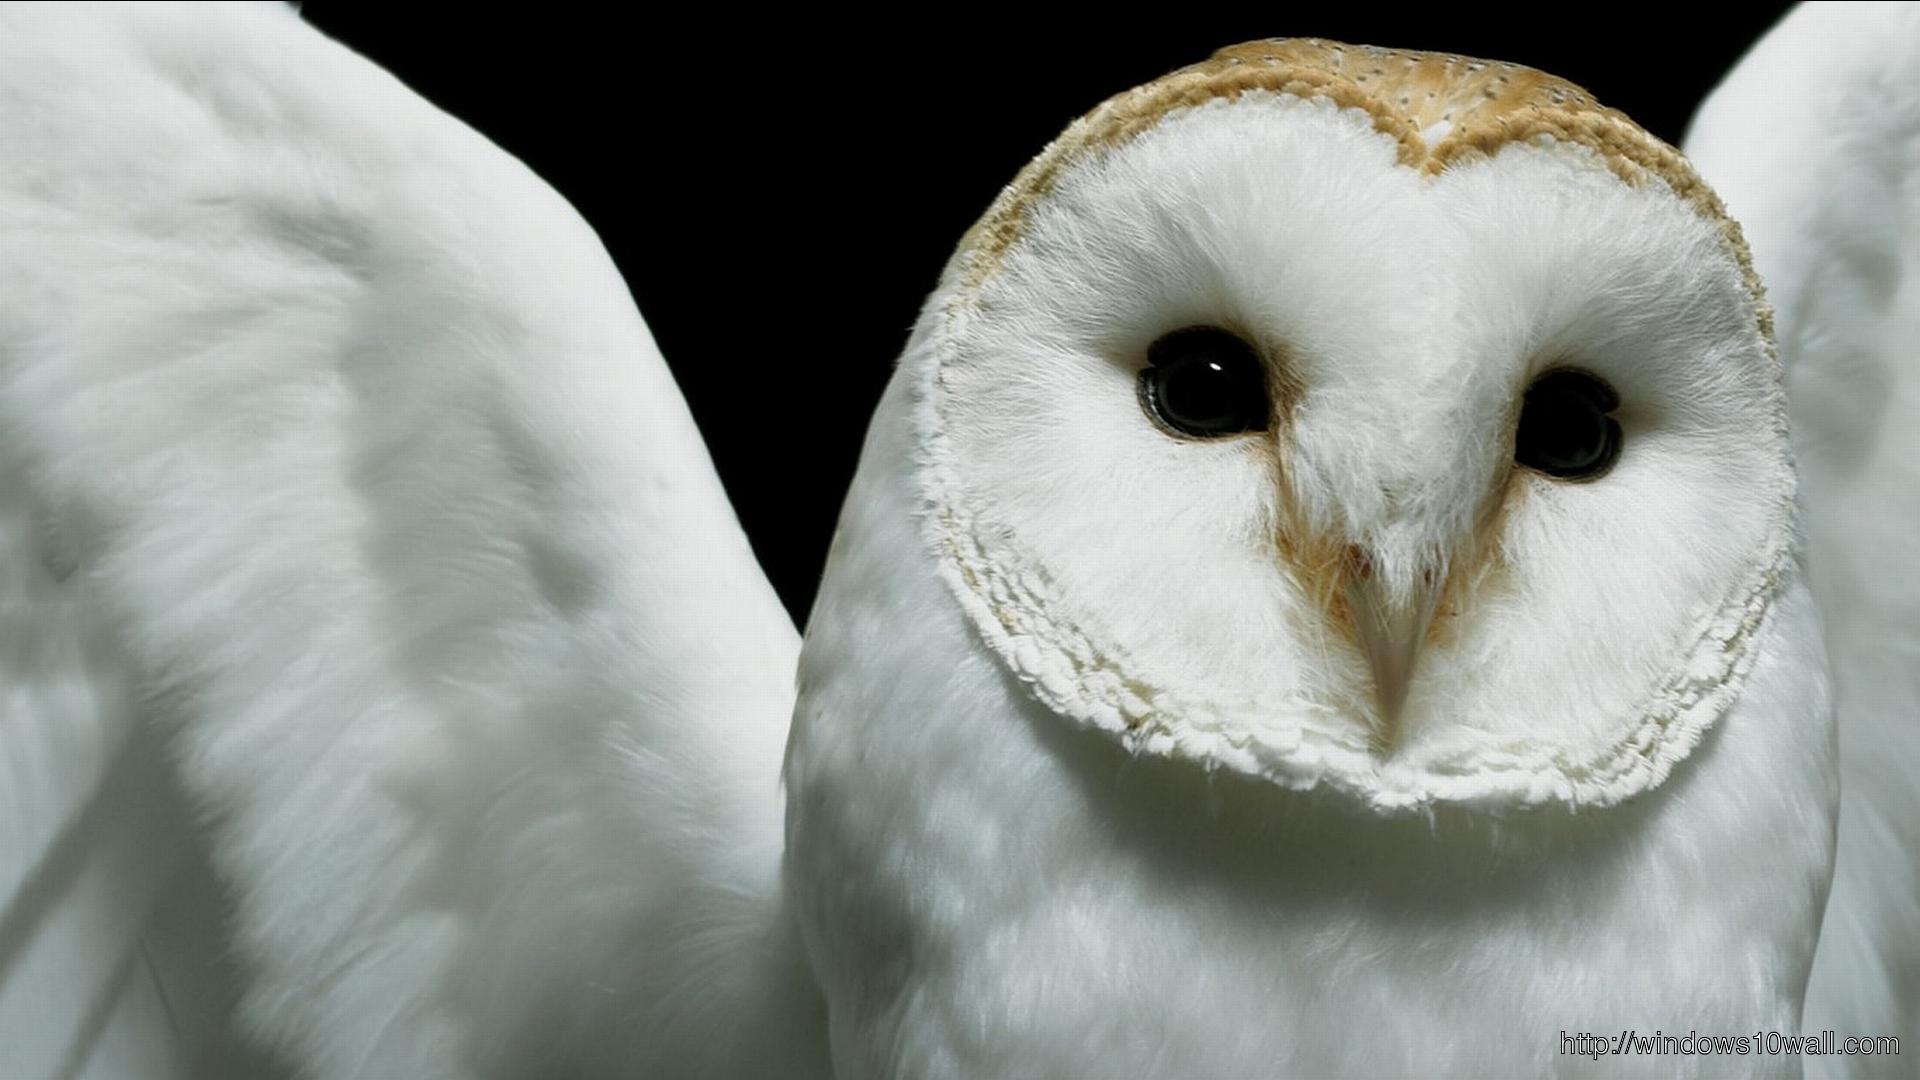 Cute White Owl Bird Wallpaper